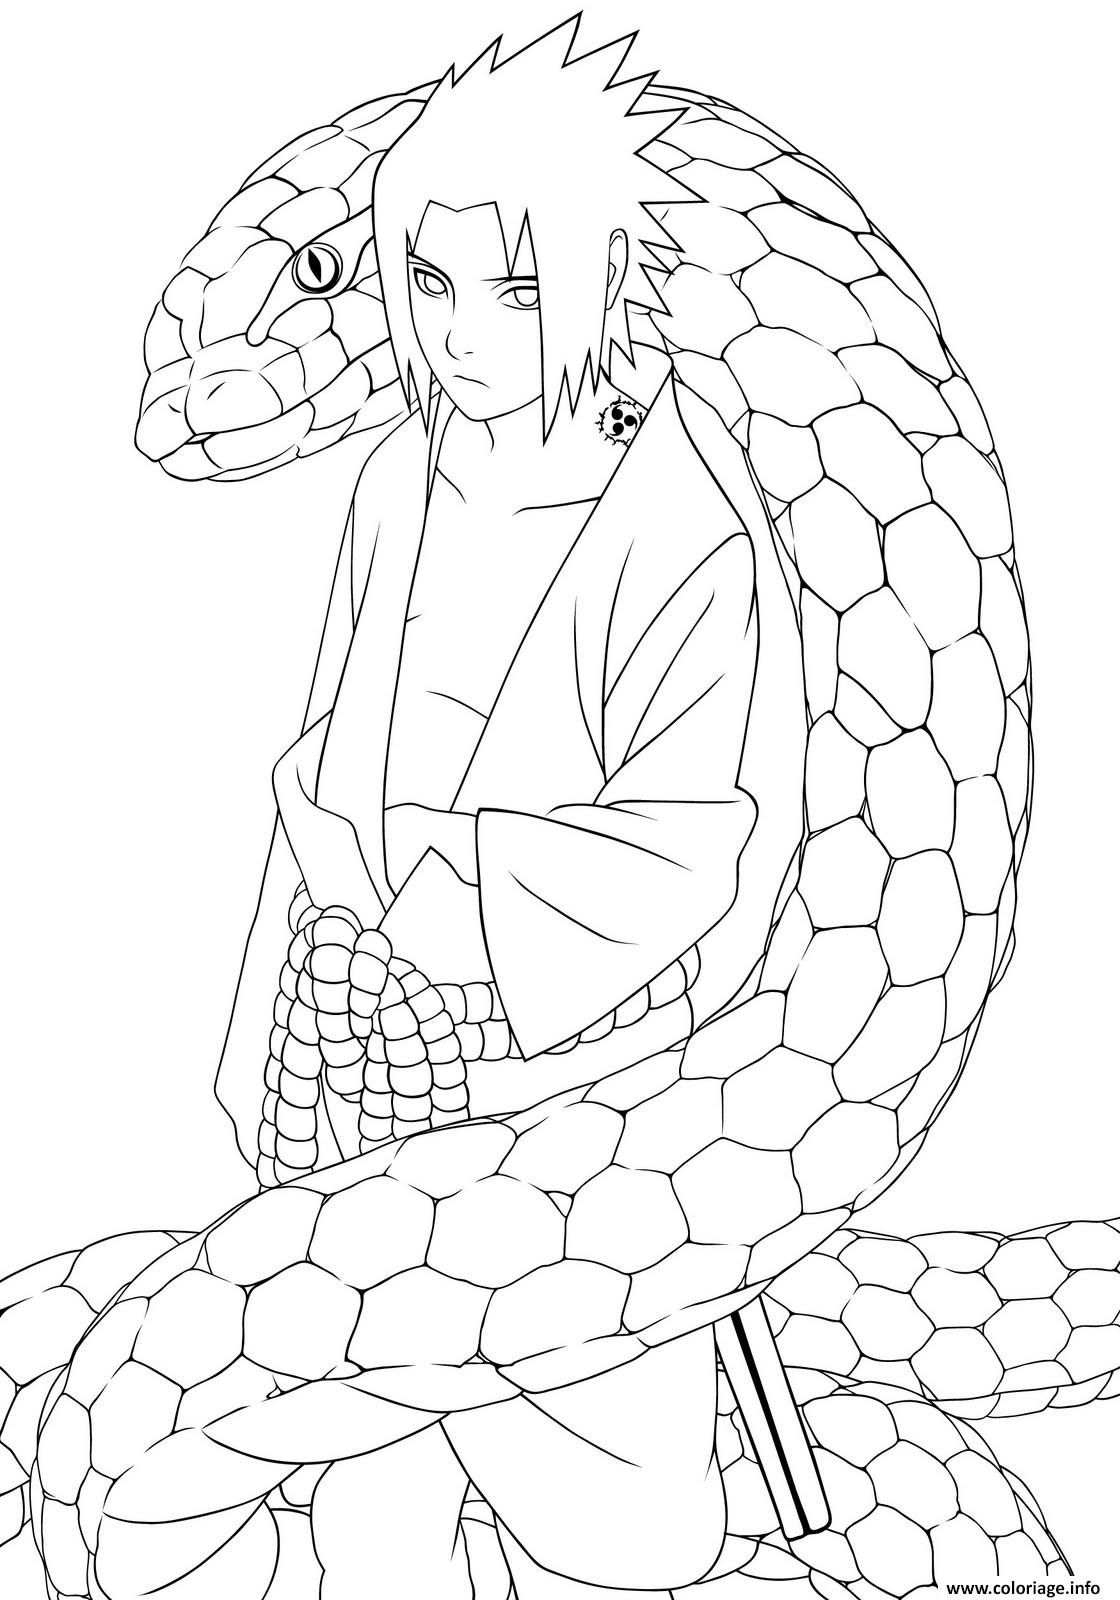 Coloriage manga naruto 2 dessin - Image de naruto a imprimer ...